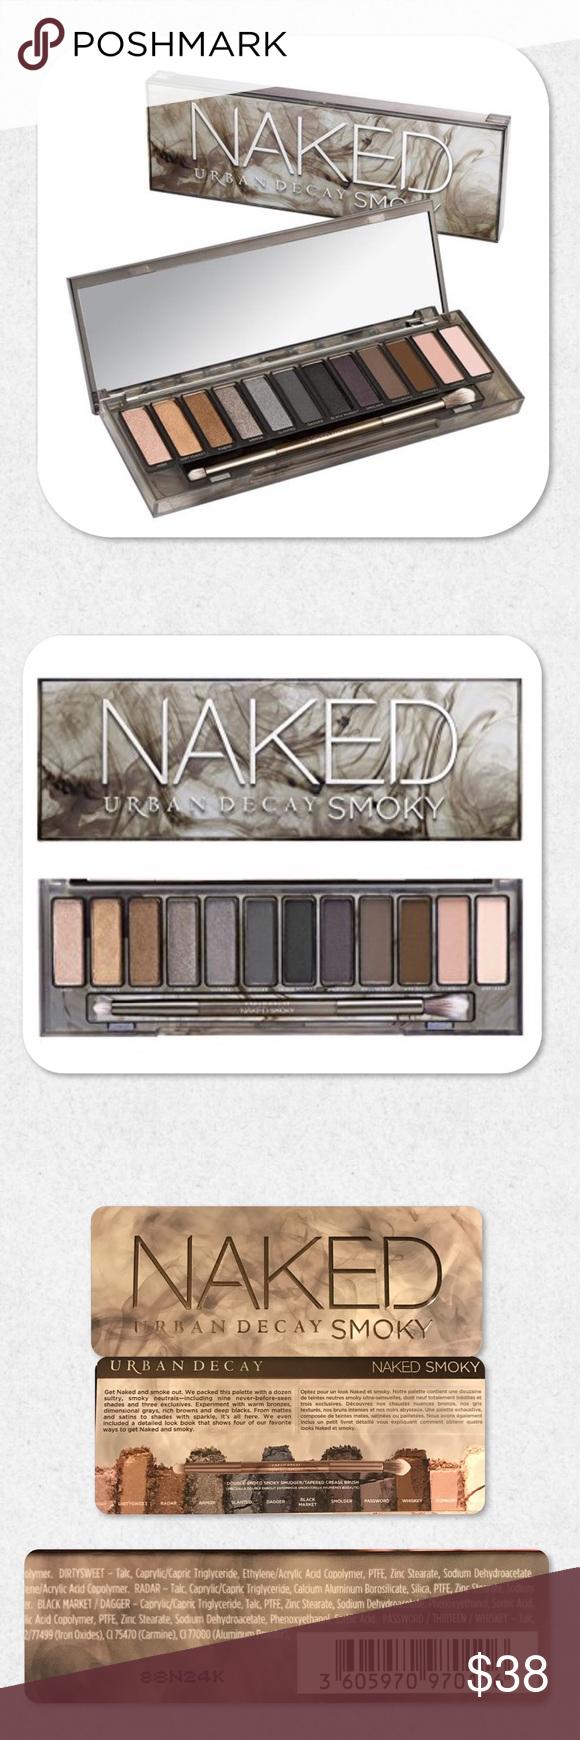 Urban Decay Naked Smoky Eyeshadow Palette Nwt My Posh Picks 210856d1887c8c37949ea2adbe22f116